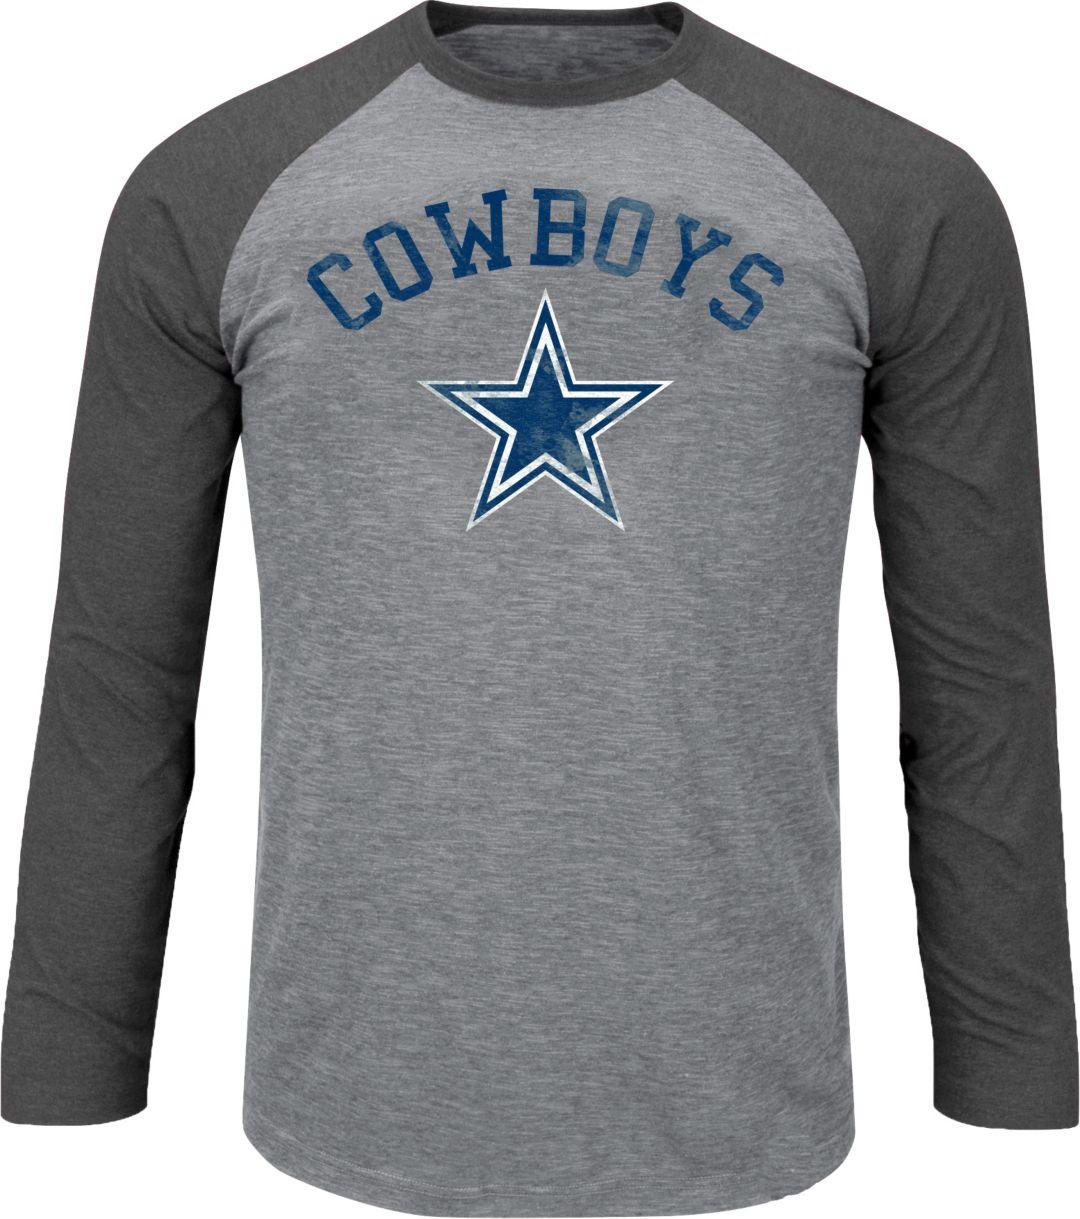 finest selection 69f6d 935c8 Dallas Cowboys Merchandising Men's Grey Long Sleeve Raglan Shirt